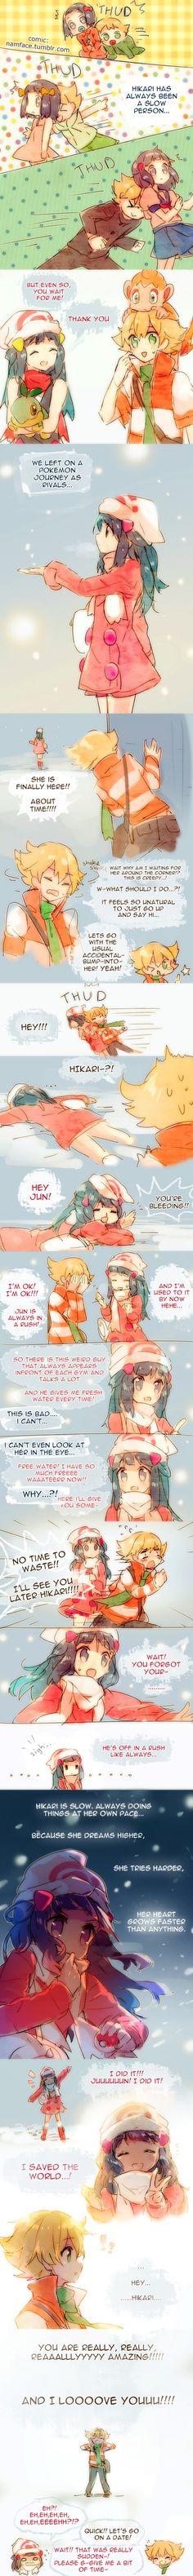 Namie-kun, Pokémon, Hikari (Pokémon), Chimchar, Turtwig, Jun (Pokémon)